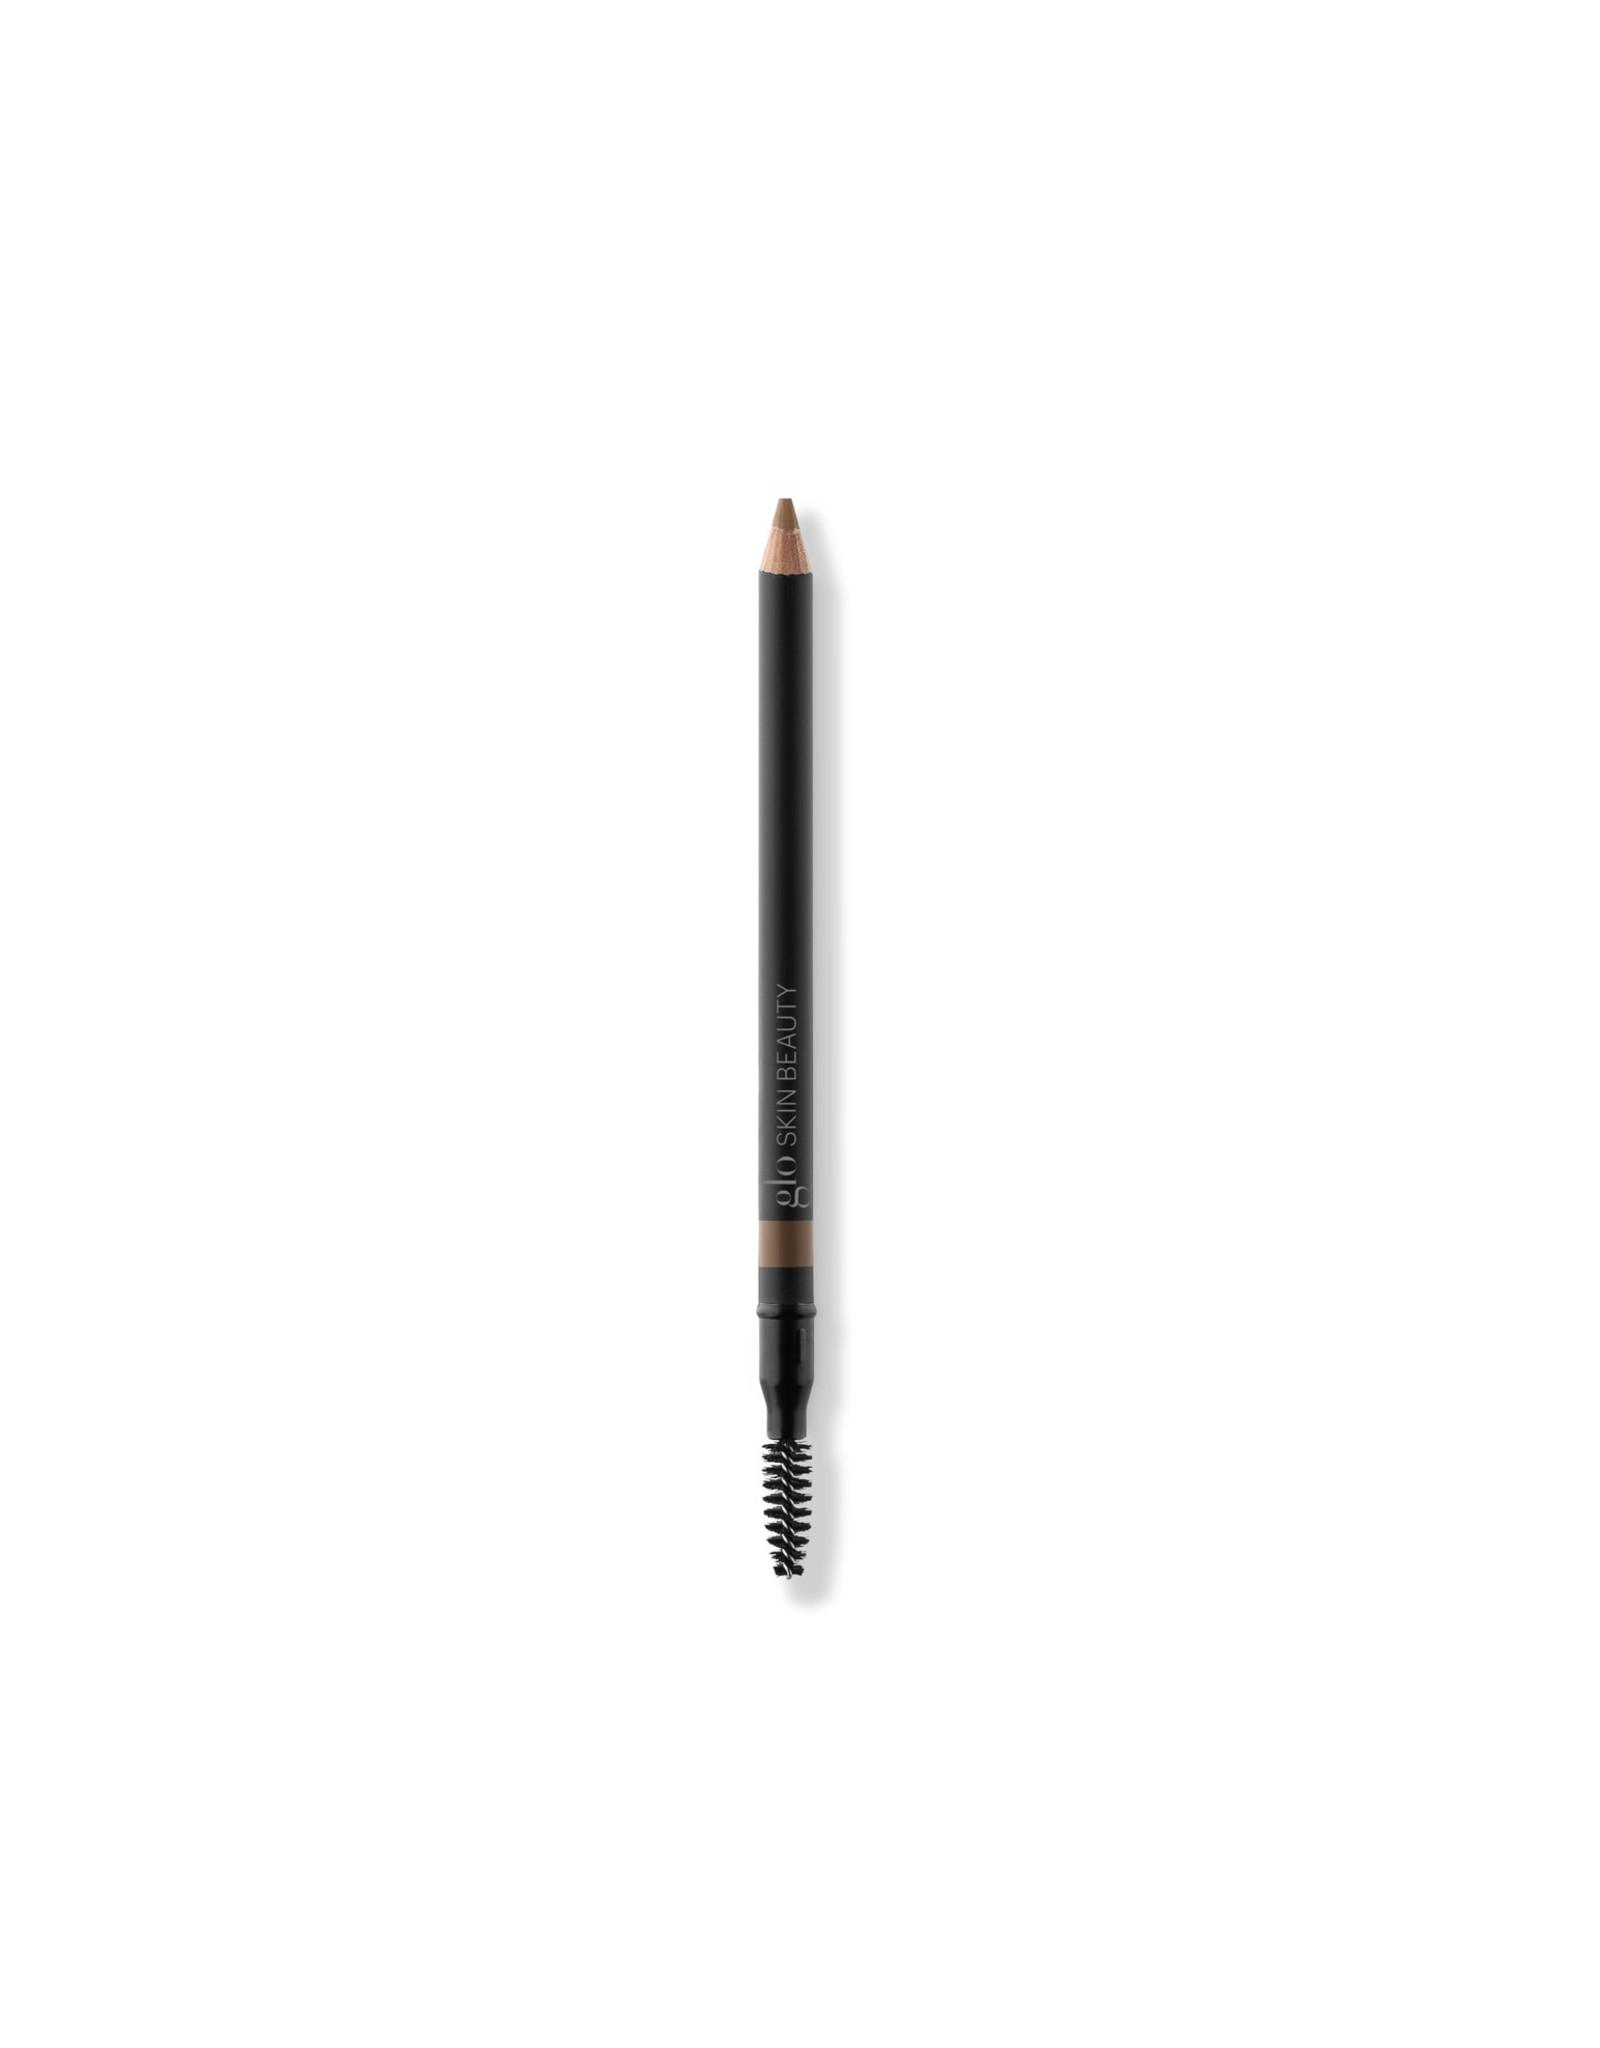 Glo Skin Beauty Precision Brow Pencil